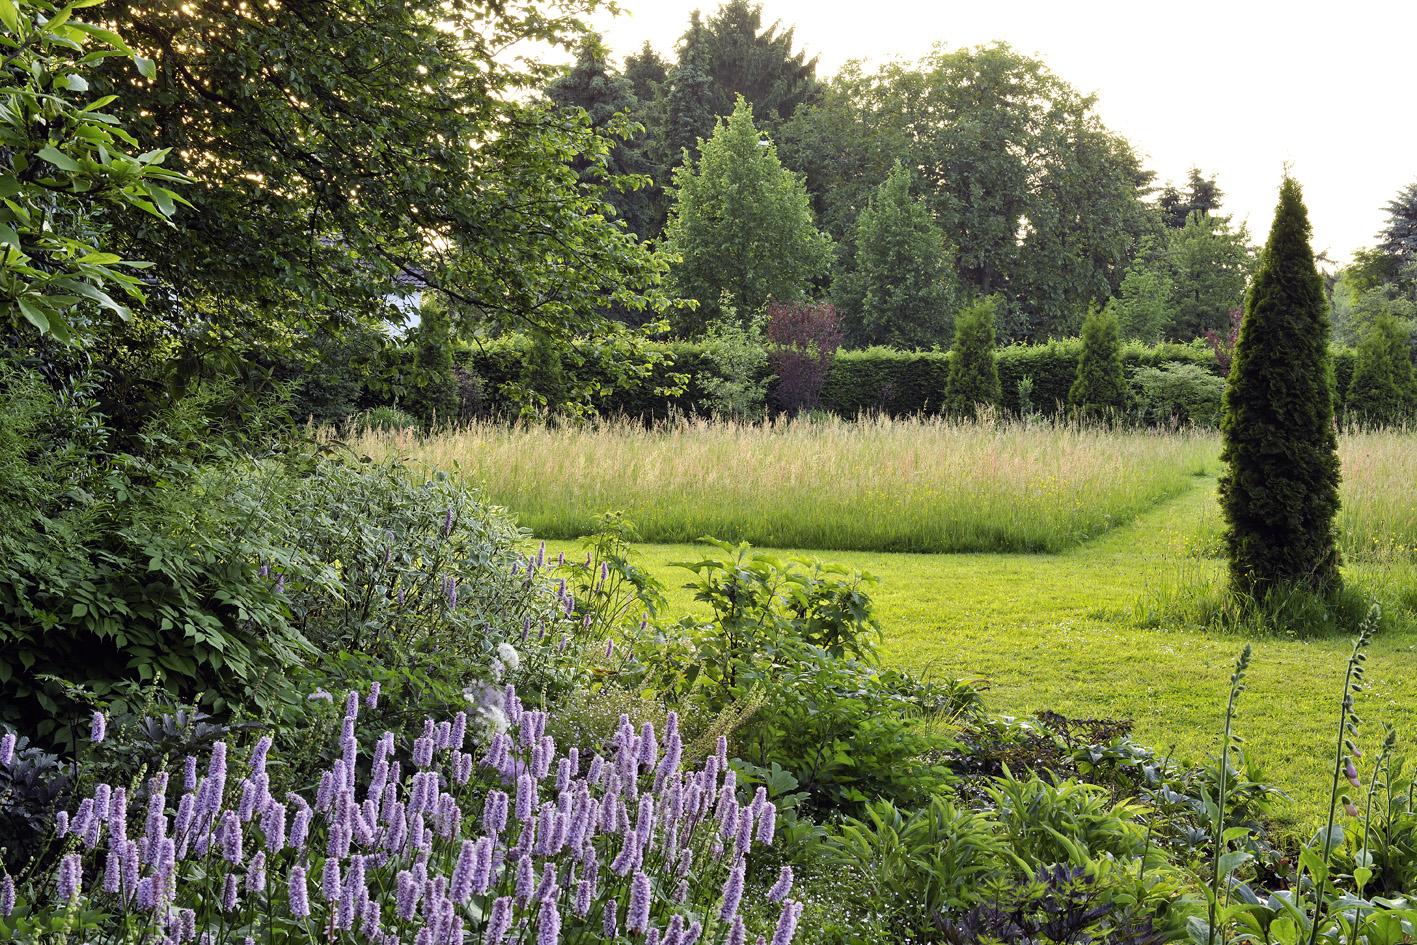 Garten design inspiration stylish inspiration ideas small for Peter janke design mit pflanzen